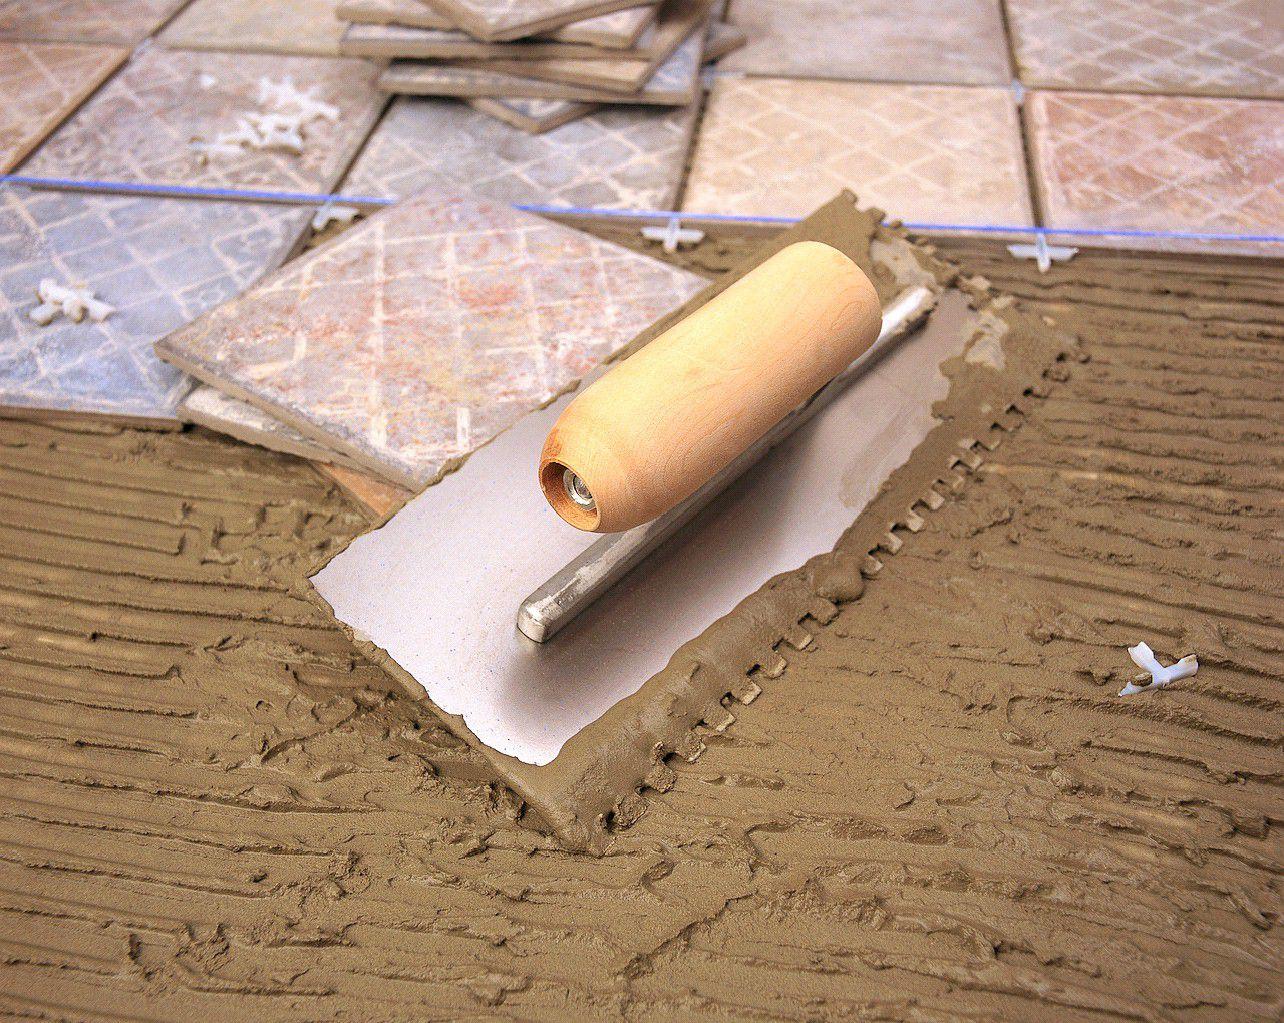 Tile Installation Tips – Tiling Mistakes to Avoid